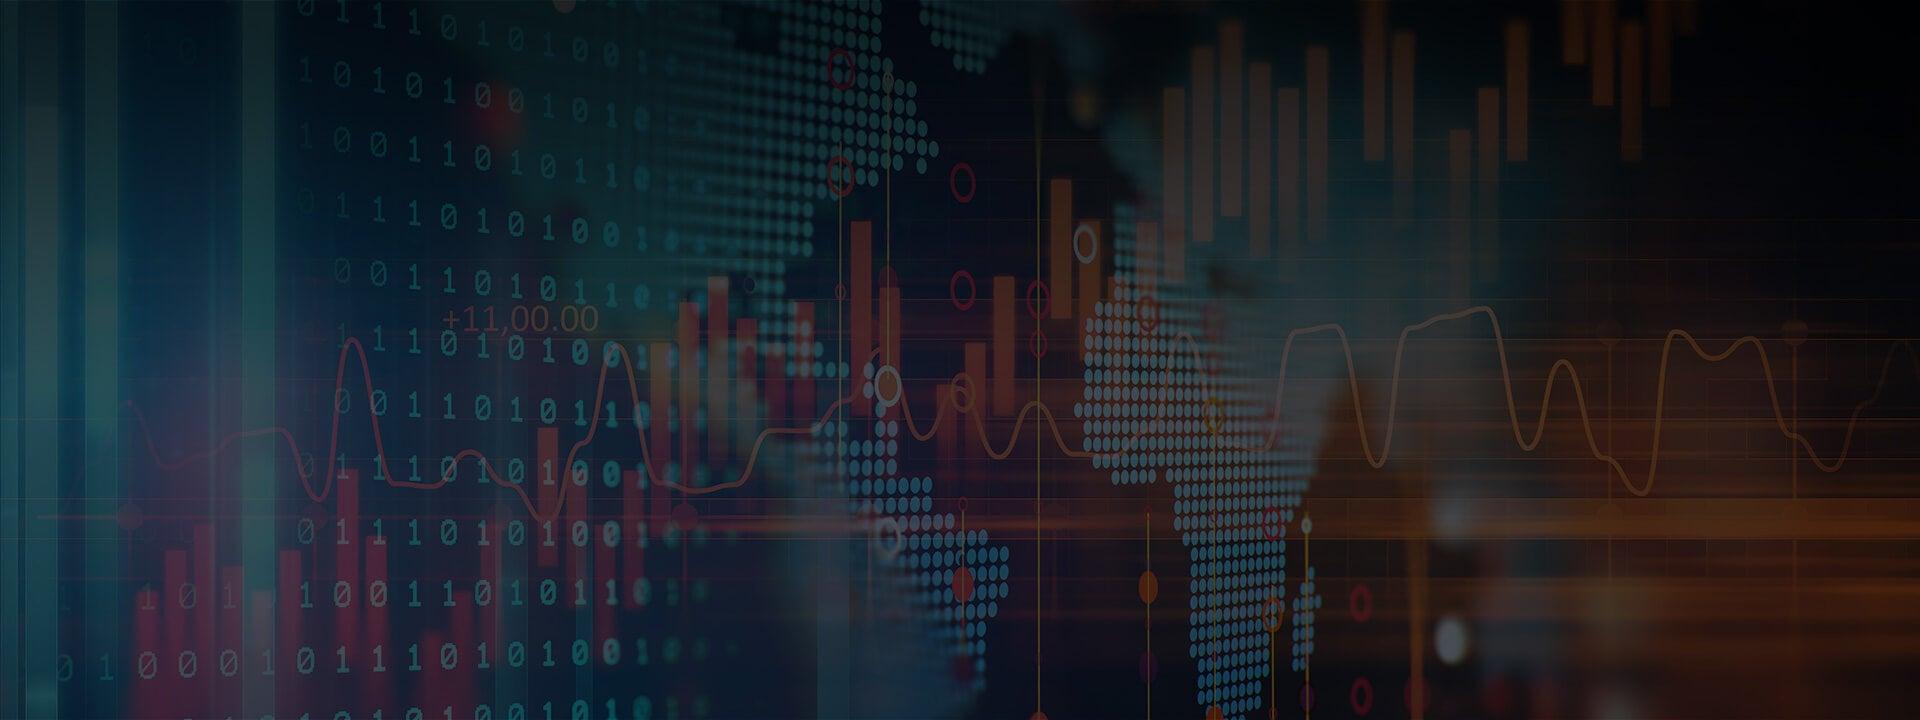 DataRobot AI in Financial Markets Part 1 Box blog background image v1.0